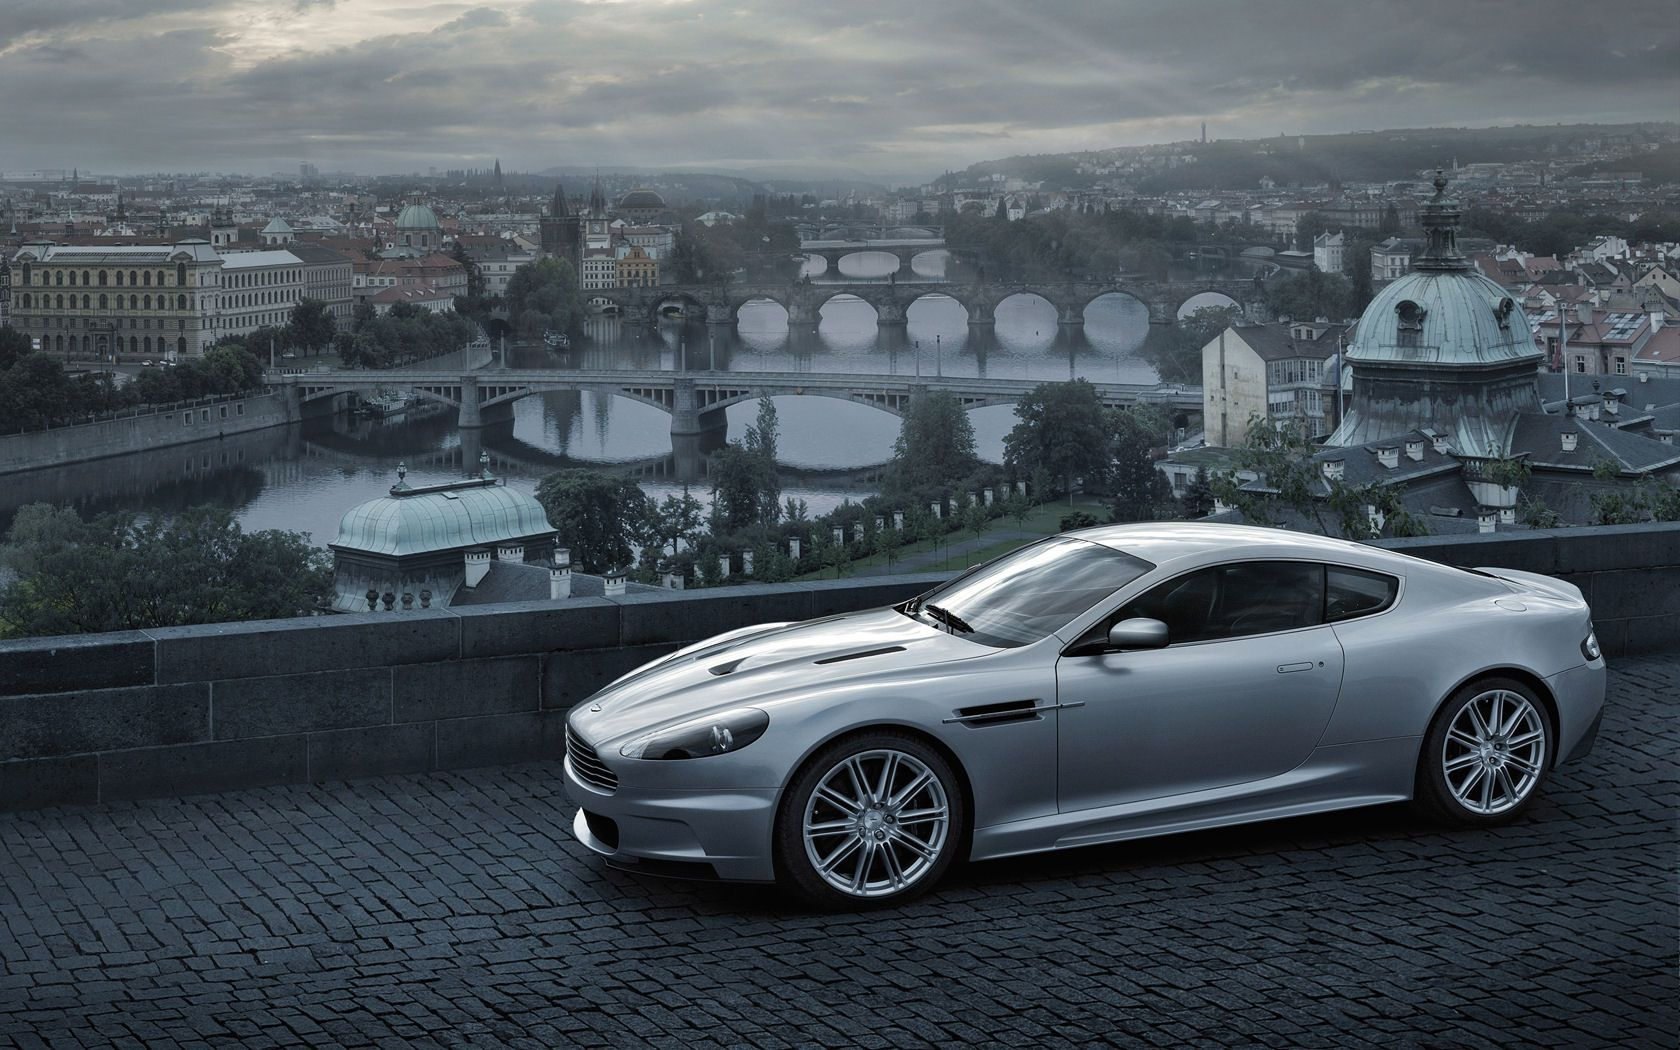 Free Aston Martin Wallpaper (85 Wallpapers)